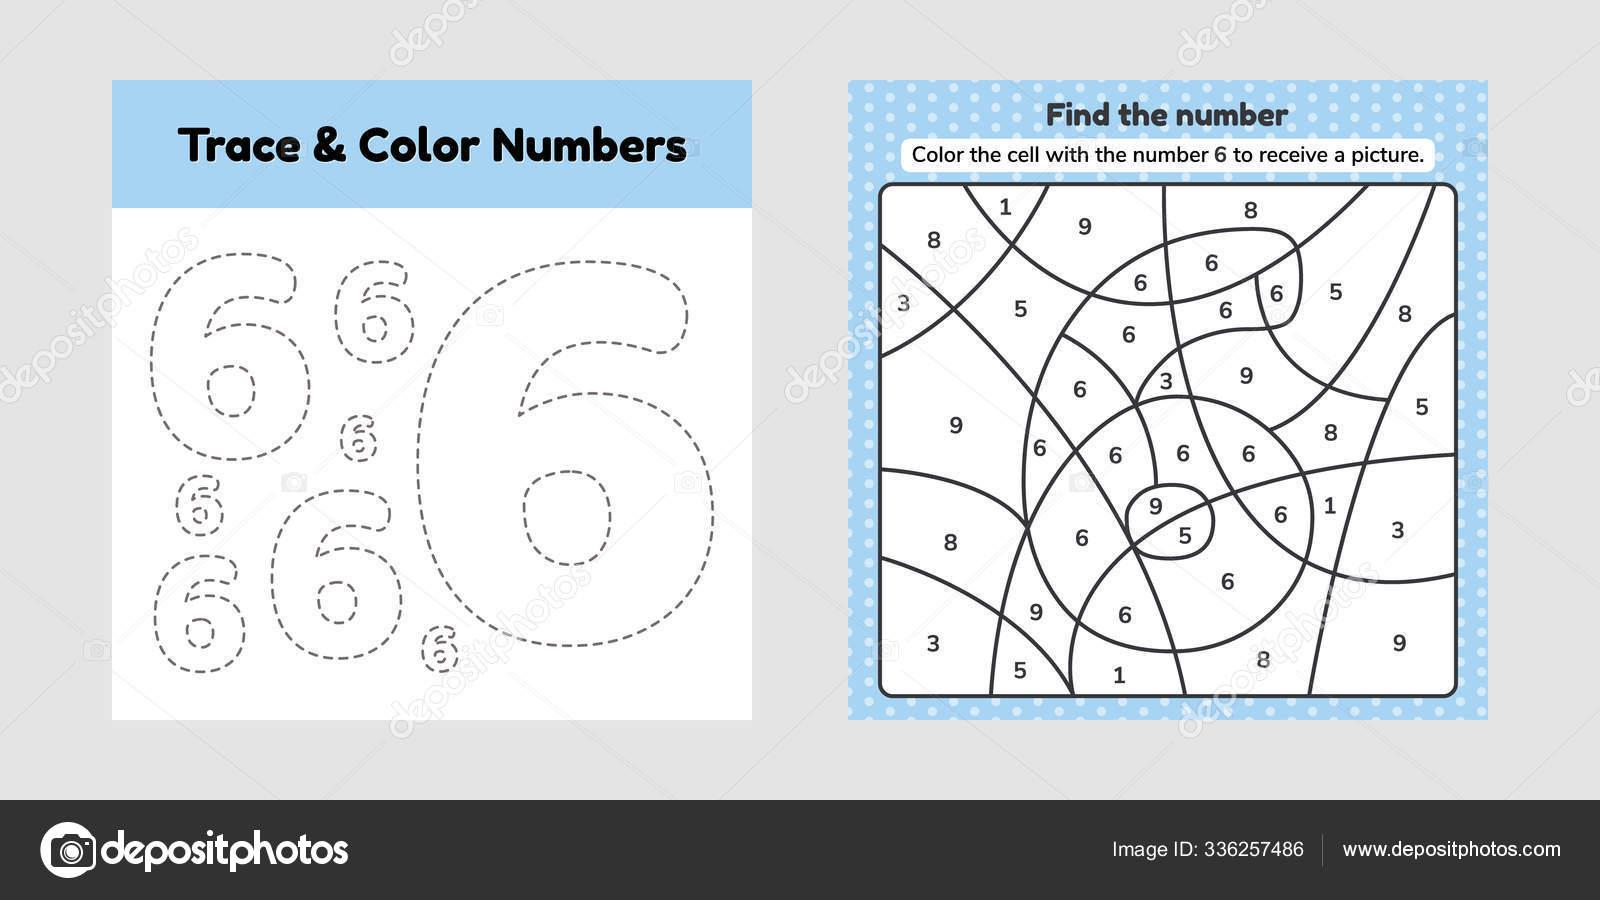 hight resolution of Coloring book number for kids. Worksheet for preschool